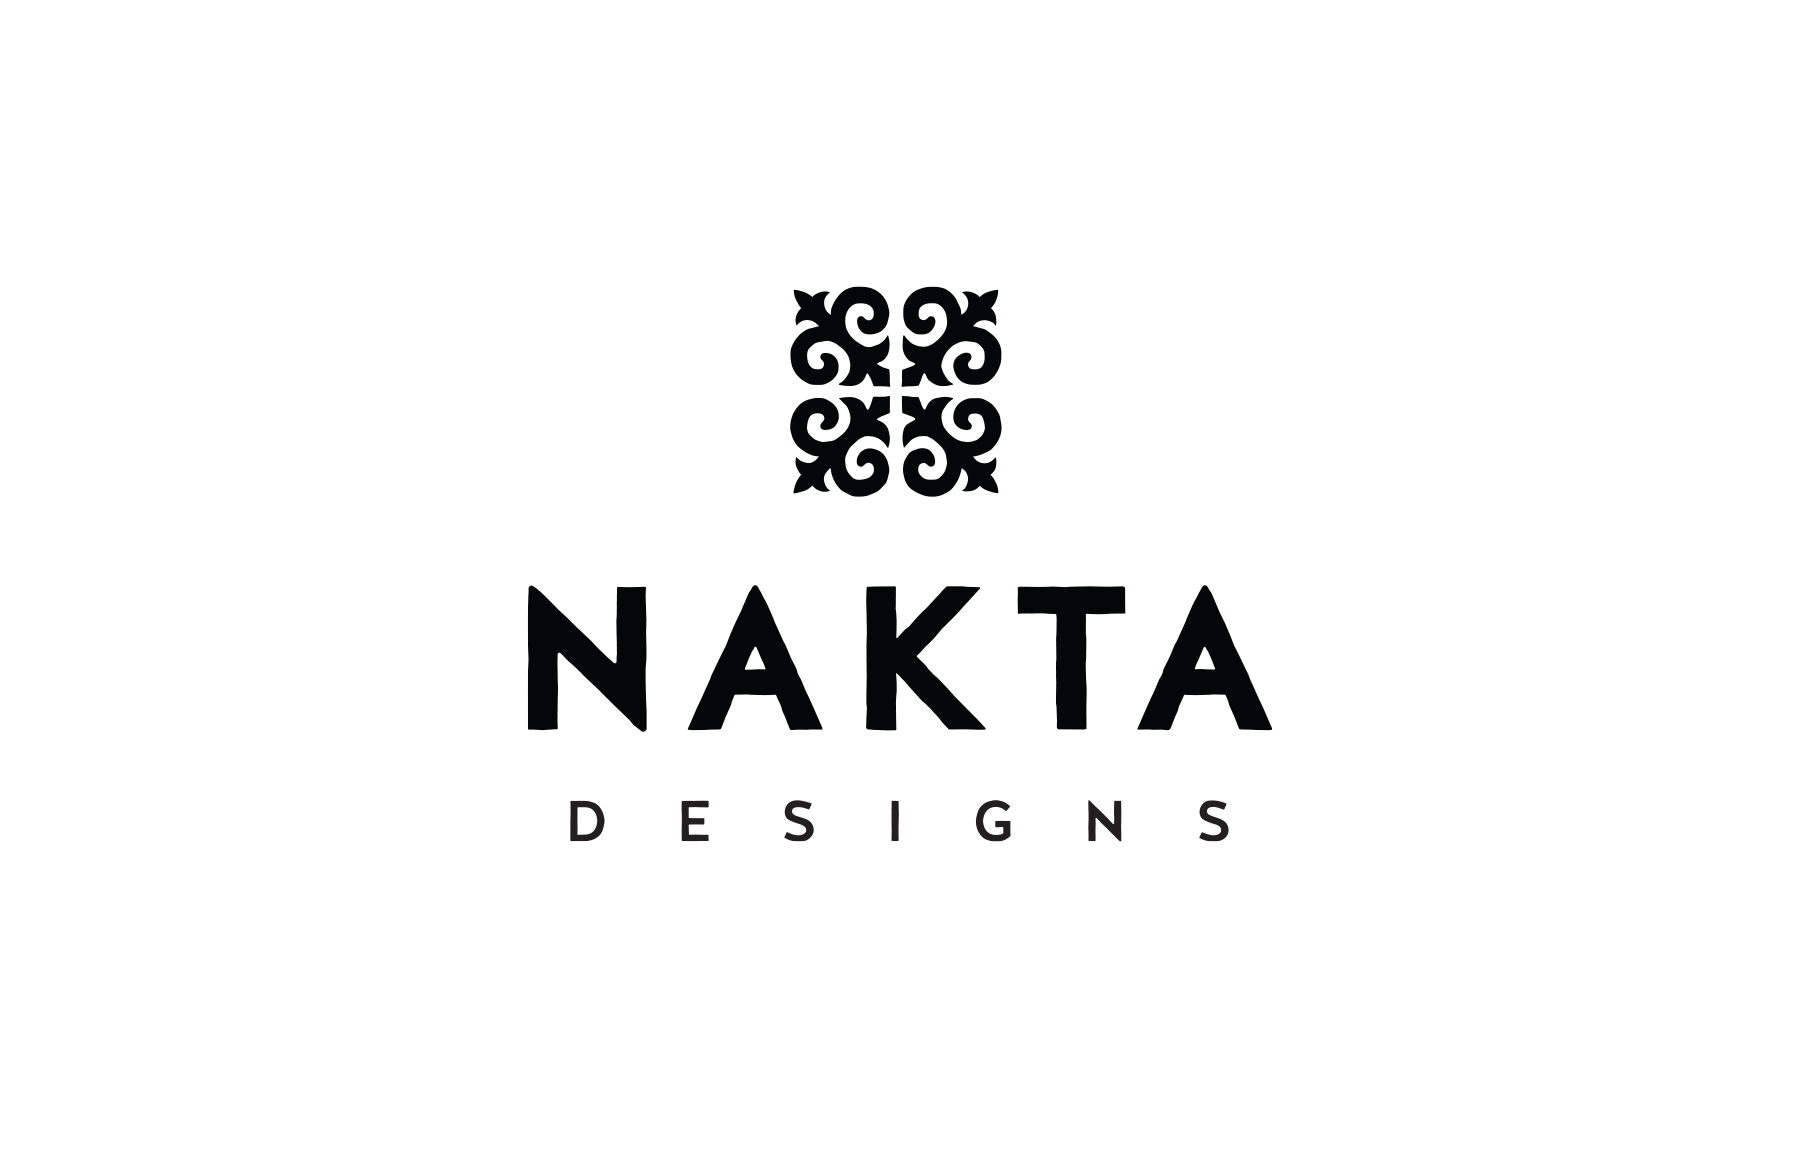 joshua_berman_design_brand_identity_logo_nakta.jpg